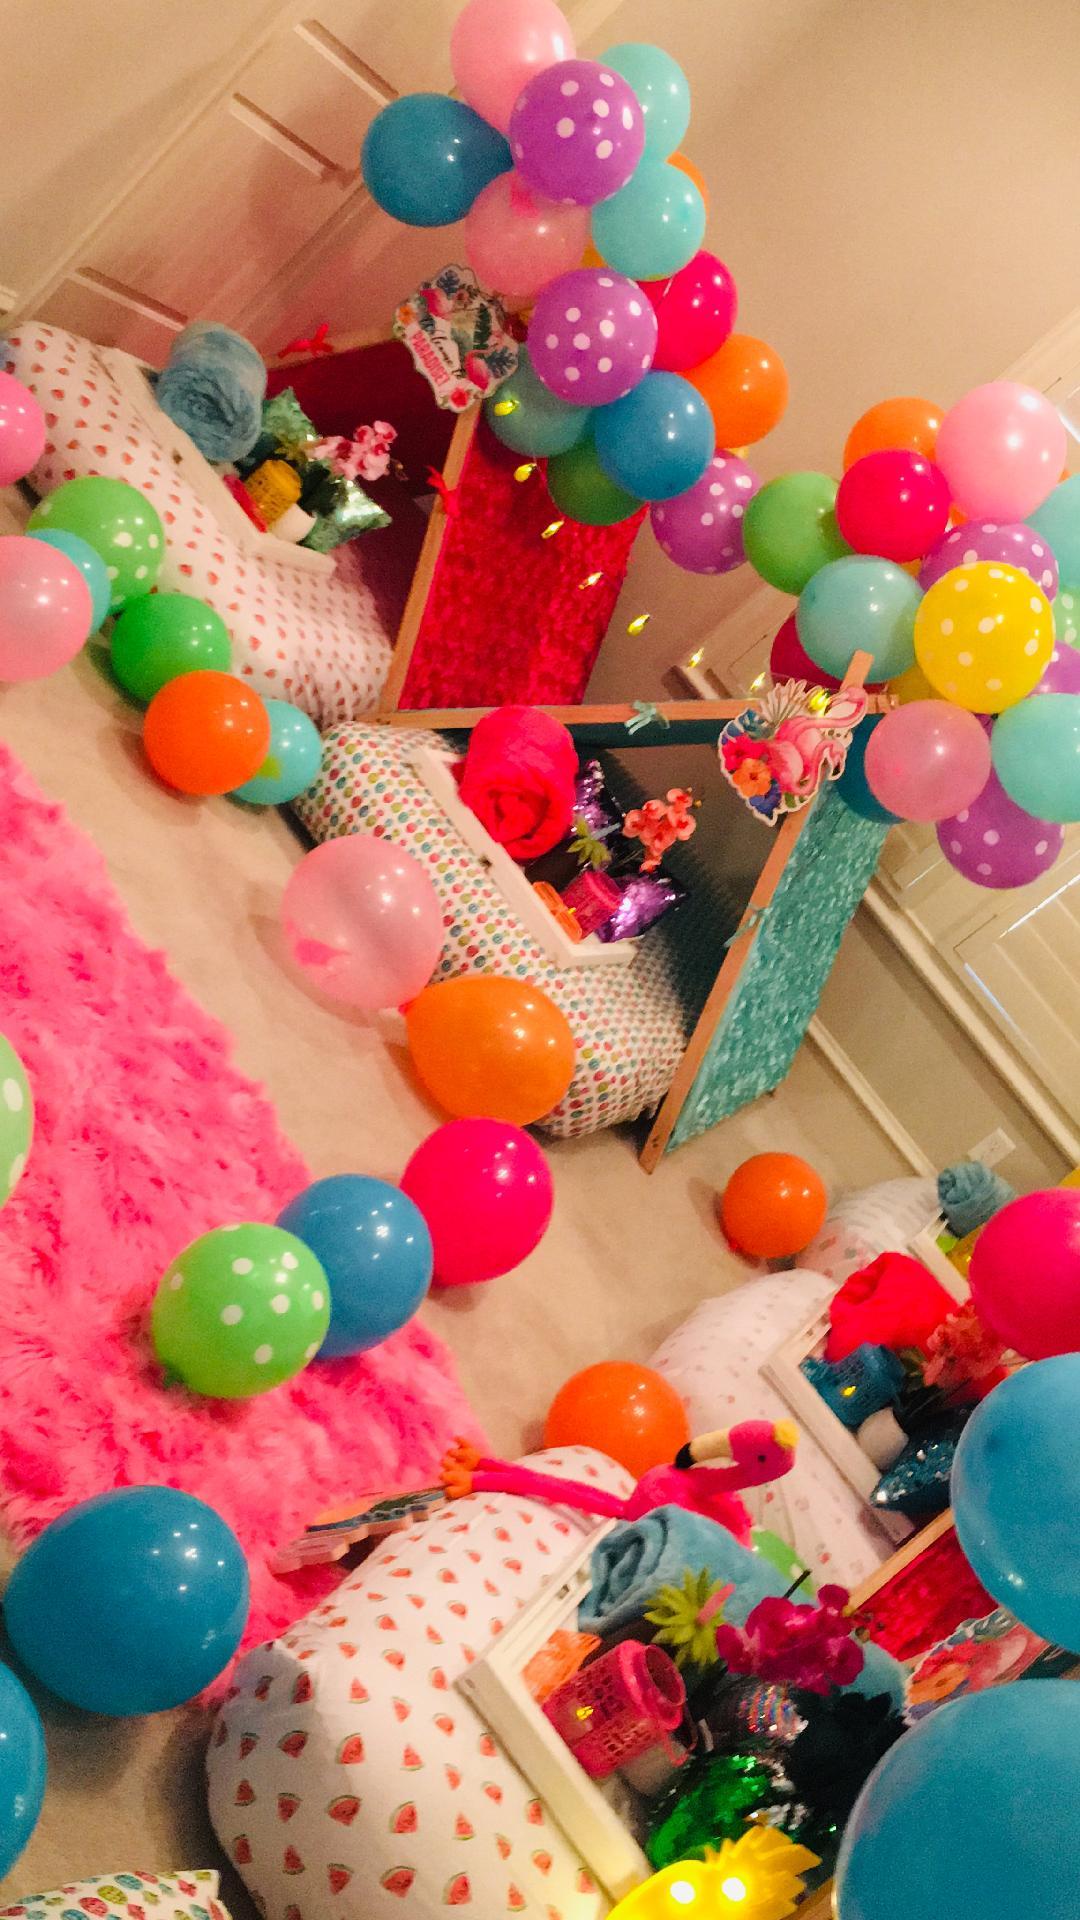 houston kids birthday teepee party tent rentals 4.jpg